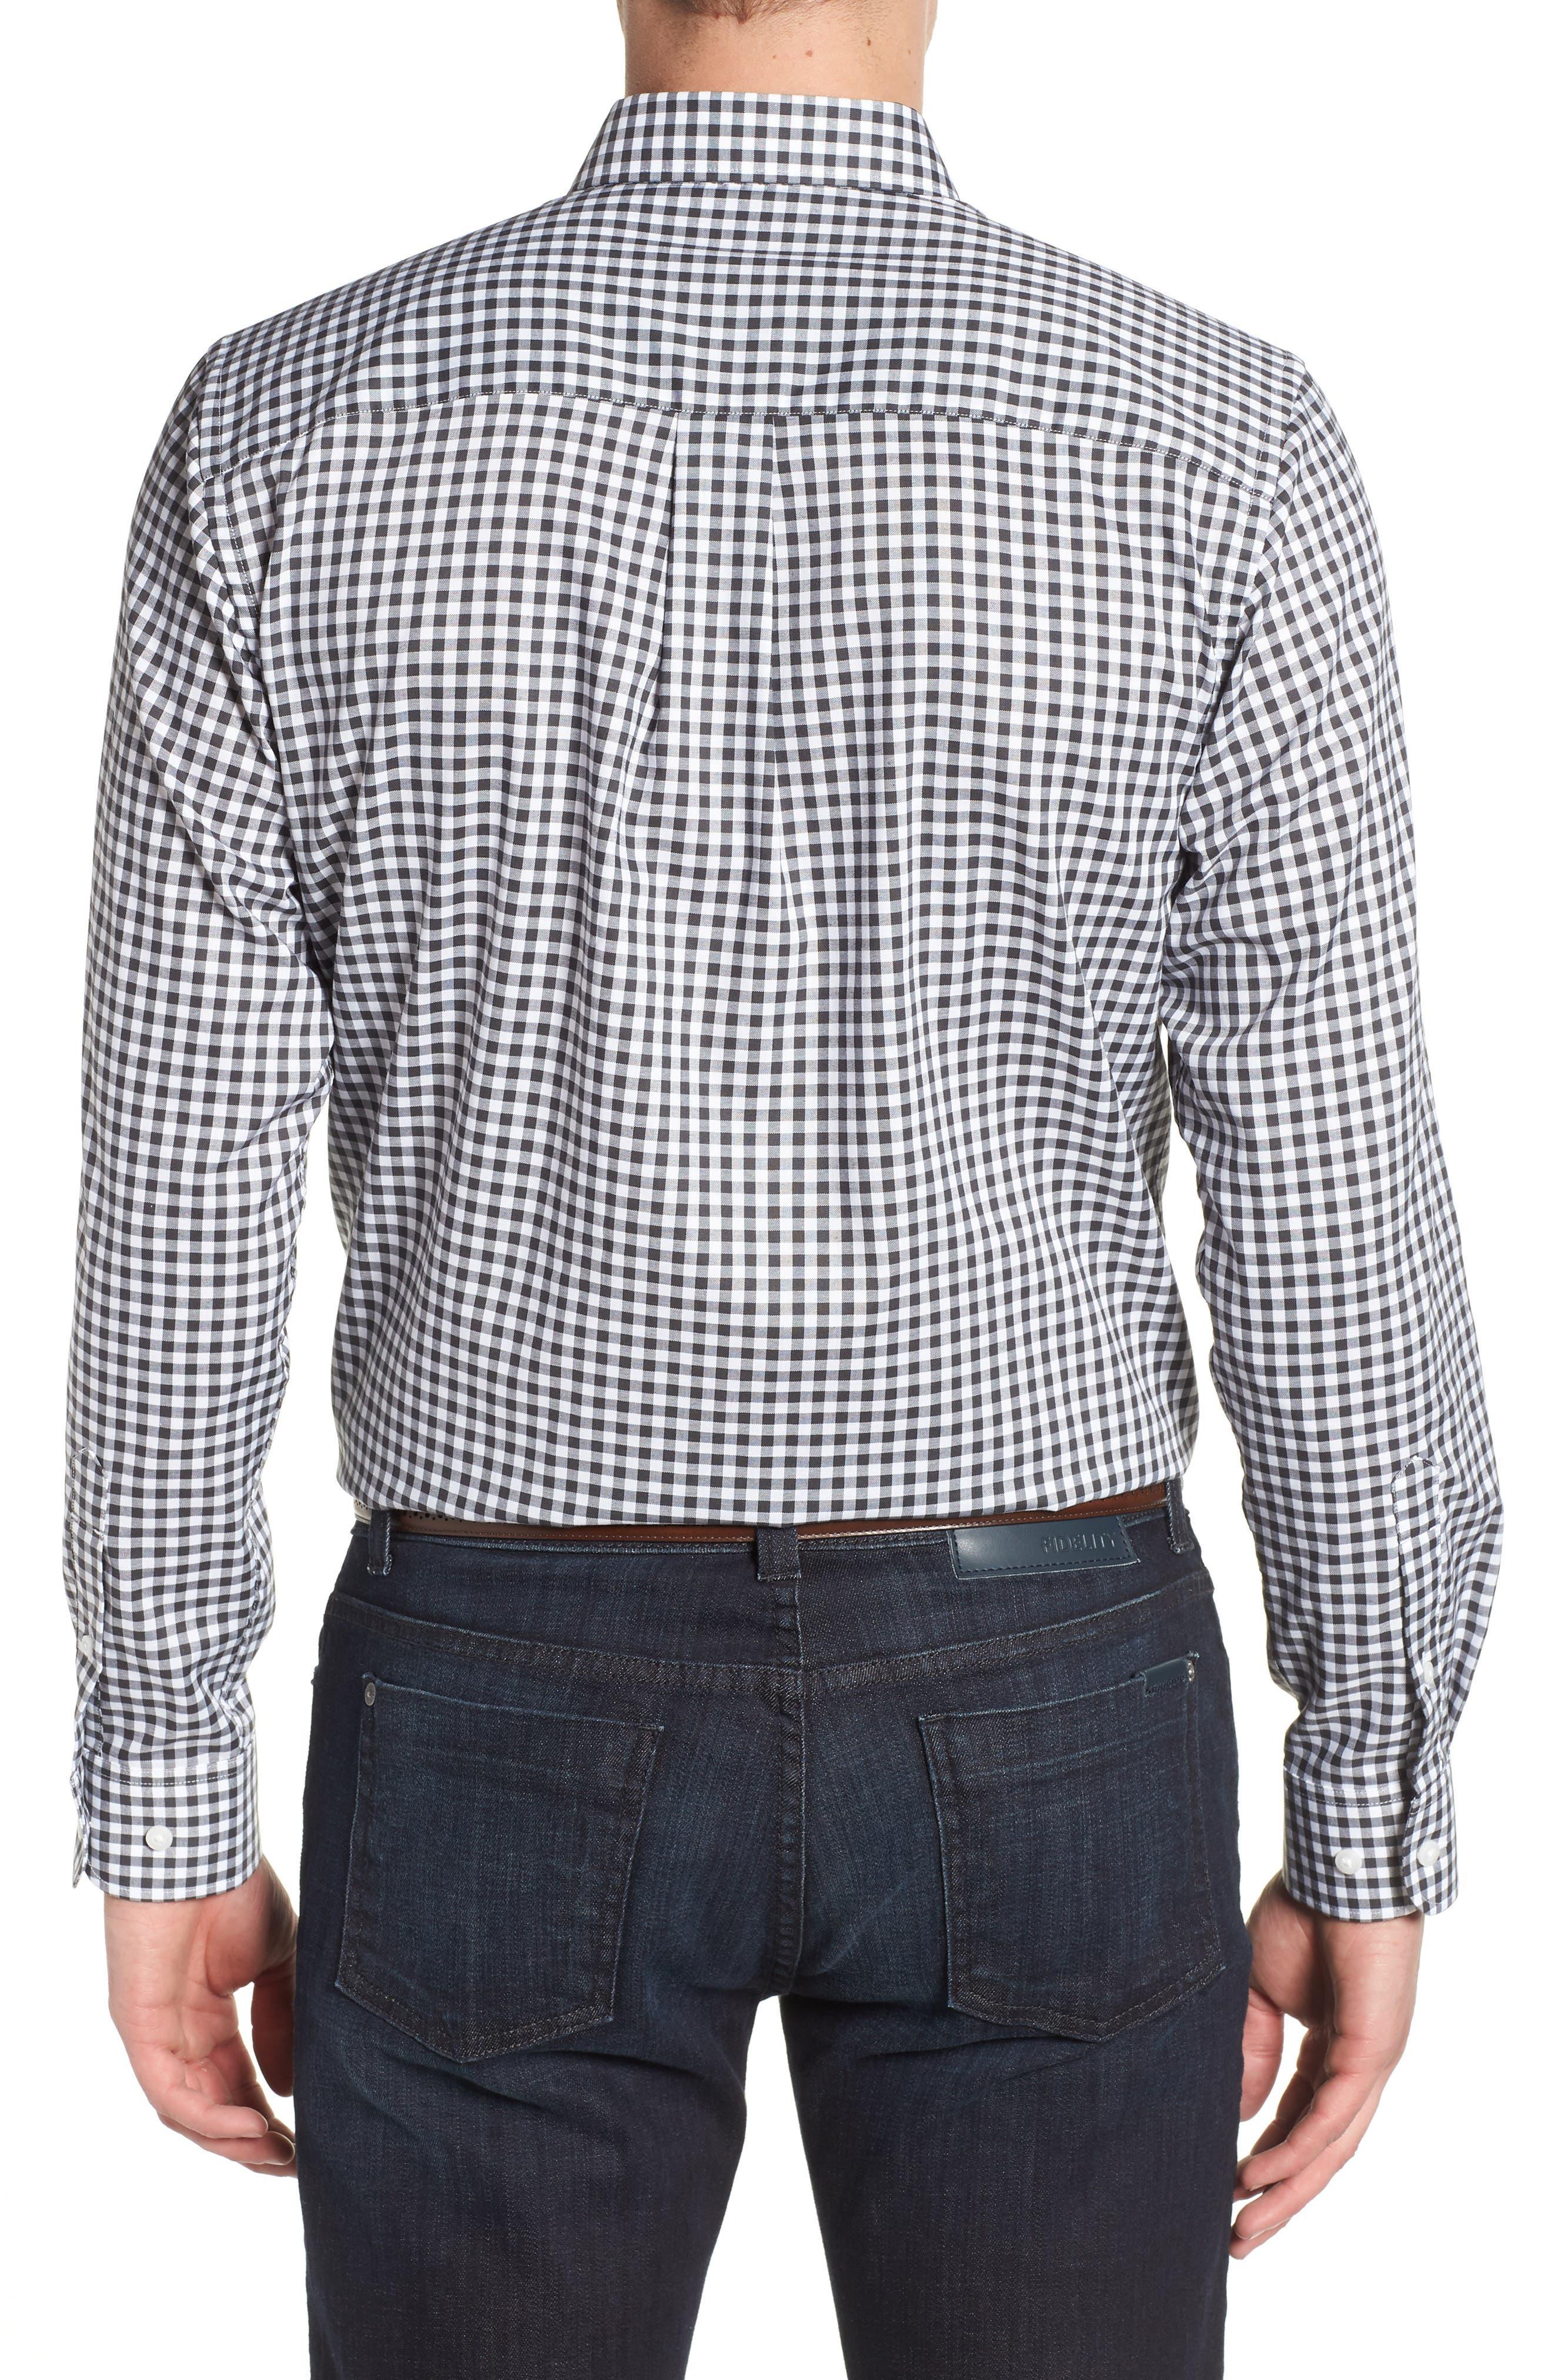 League Jacksonville Jaguars Regular Fit Shirt,                             Alternate thumbnail 2, color,                             CHARCOAL